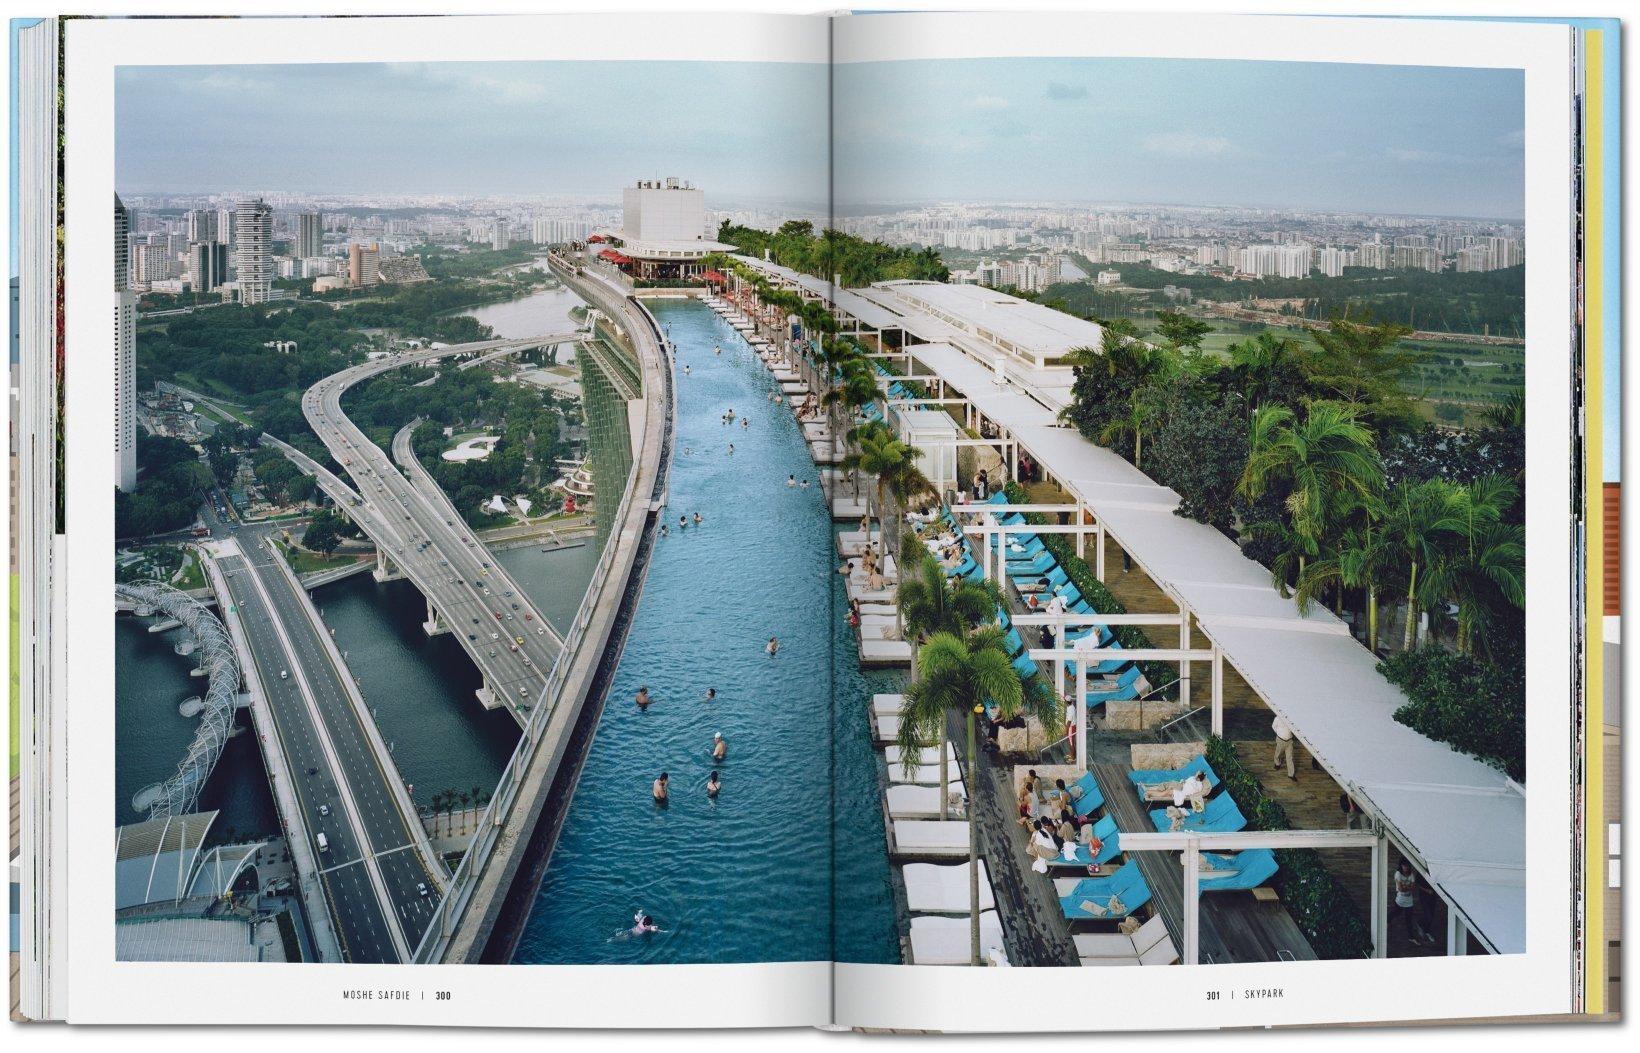 Rooftops: Islands in the Sky (Multilingual Edition): Philip Jodidio ...